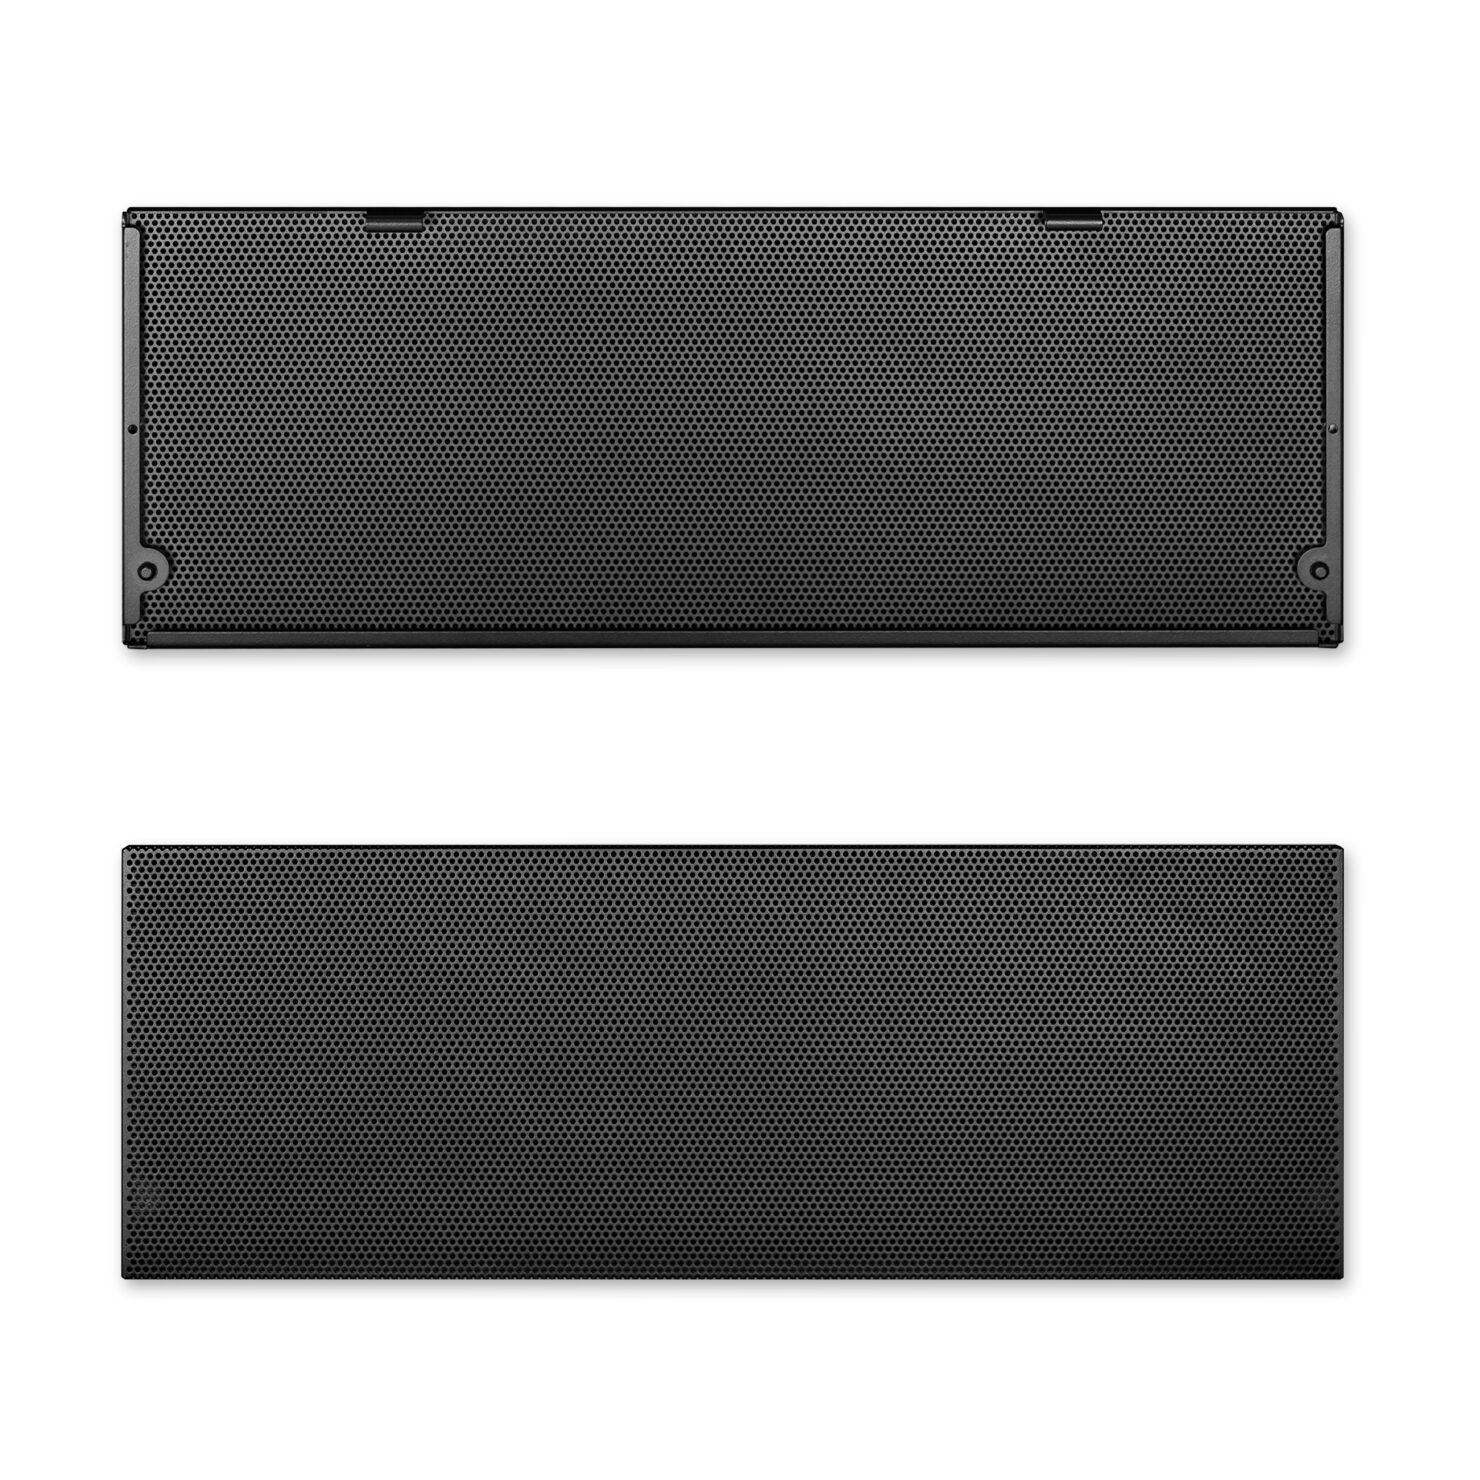 q58-mesh-panel-kit-03